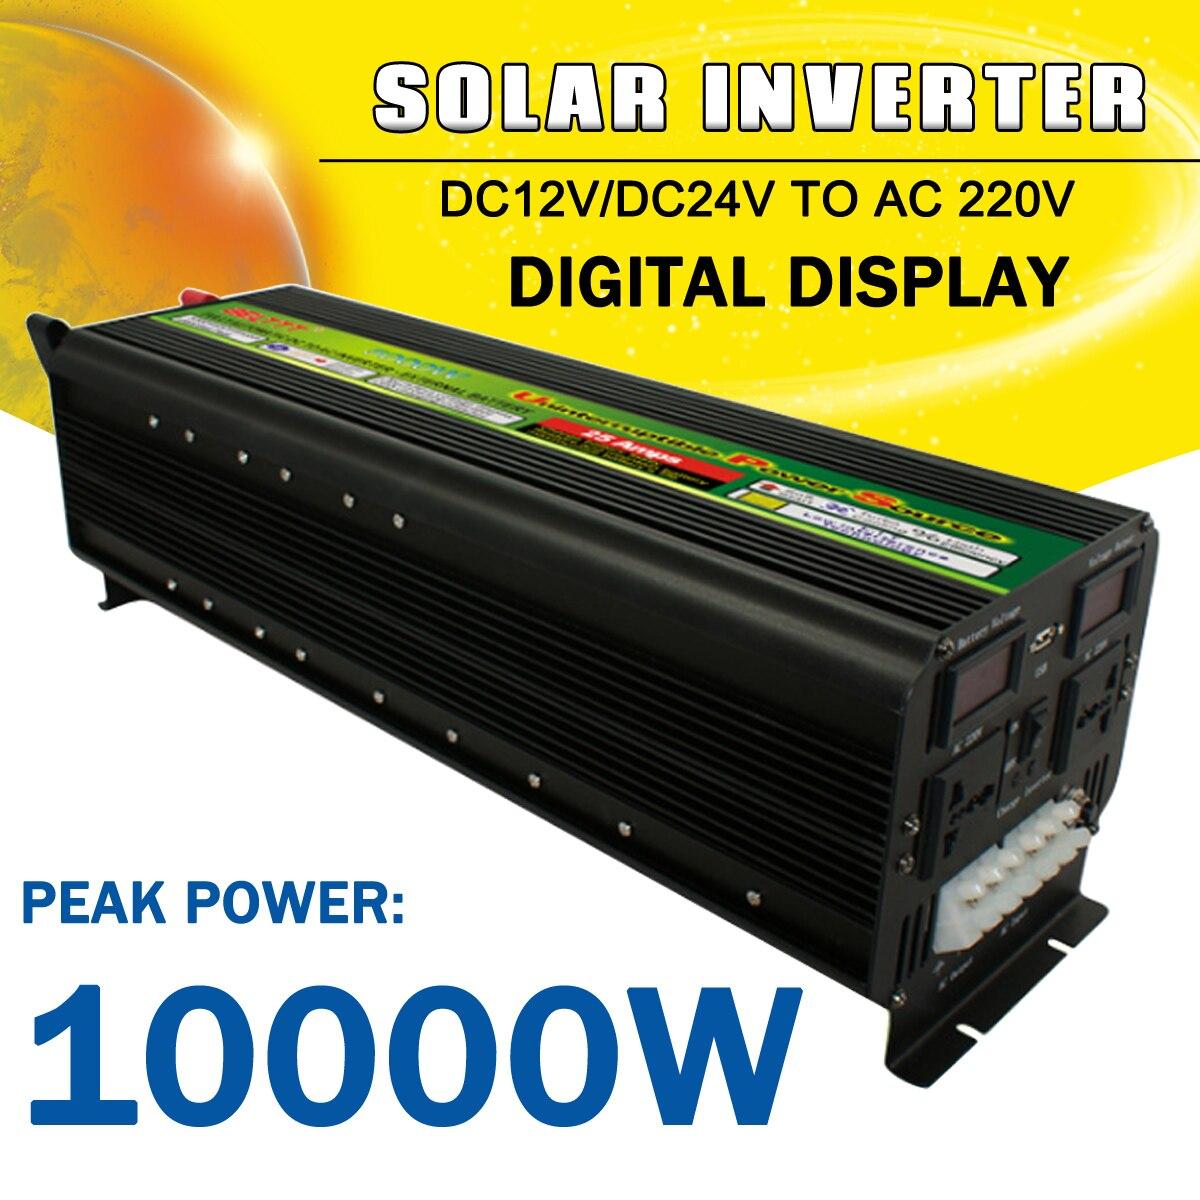 Inversor de Energia Solar Max 10000 W DC 12 V/24 V a 220 V AC Display LCD Senoidal Modificada onda Carro Conversor Adaptador de Carga para Casa Auto